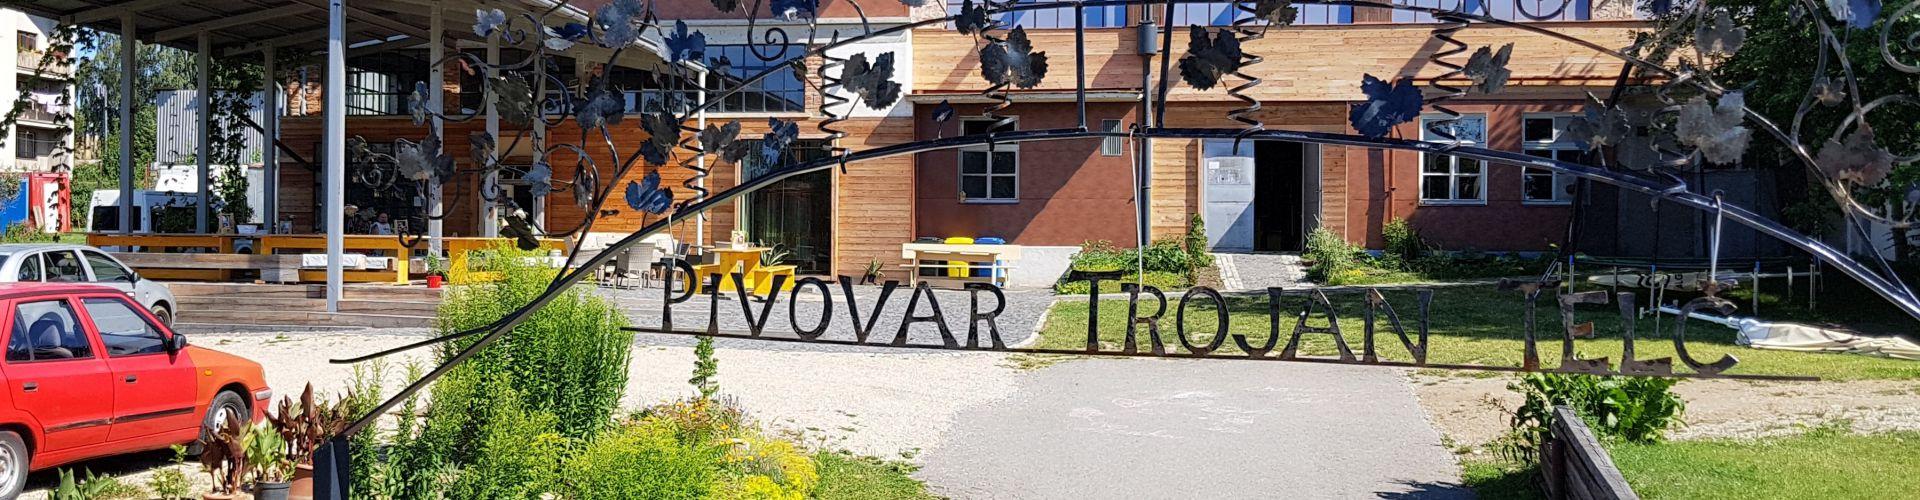 Pivovar Trojan